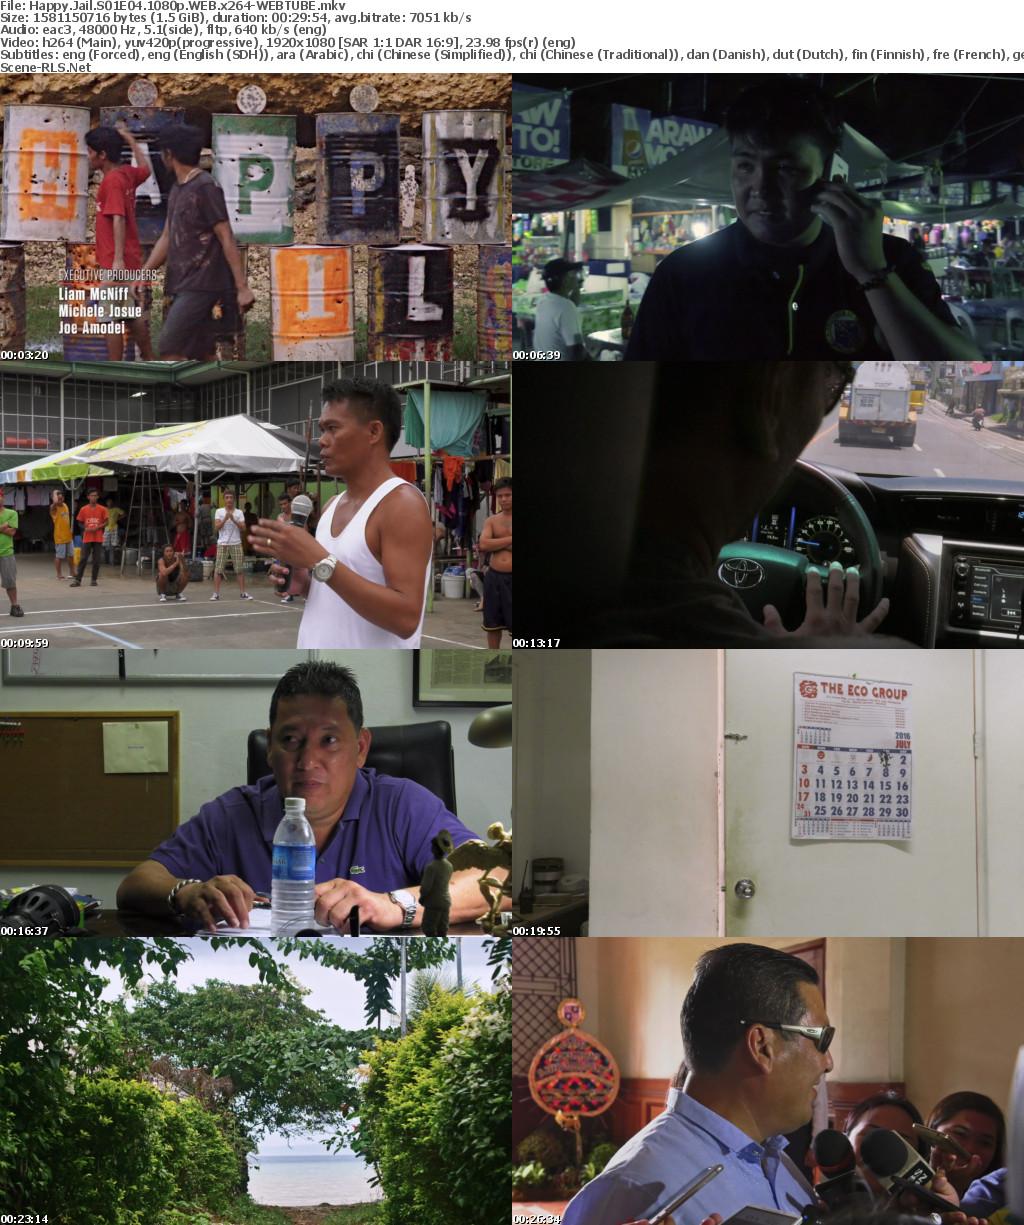 Happy Jail S01E04 1080p WEB x264-WEBTUBE - Scene Release